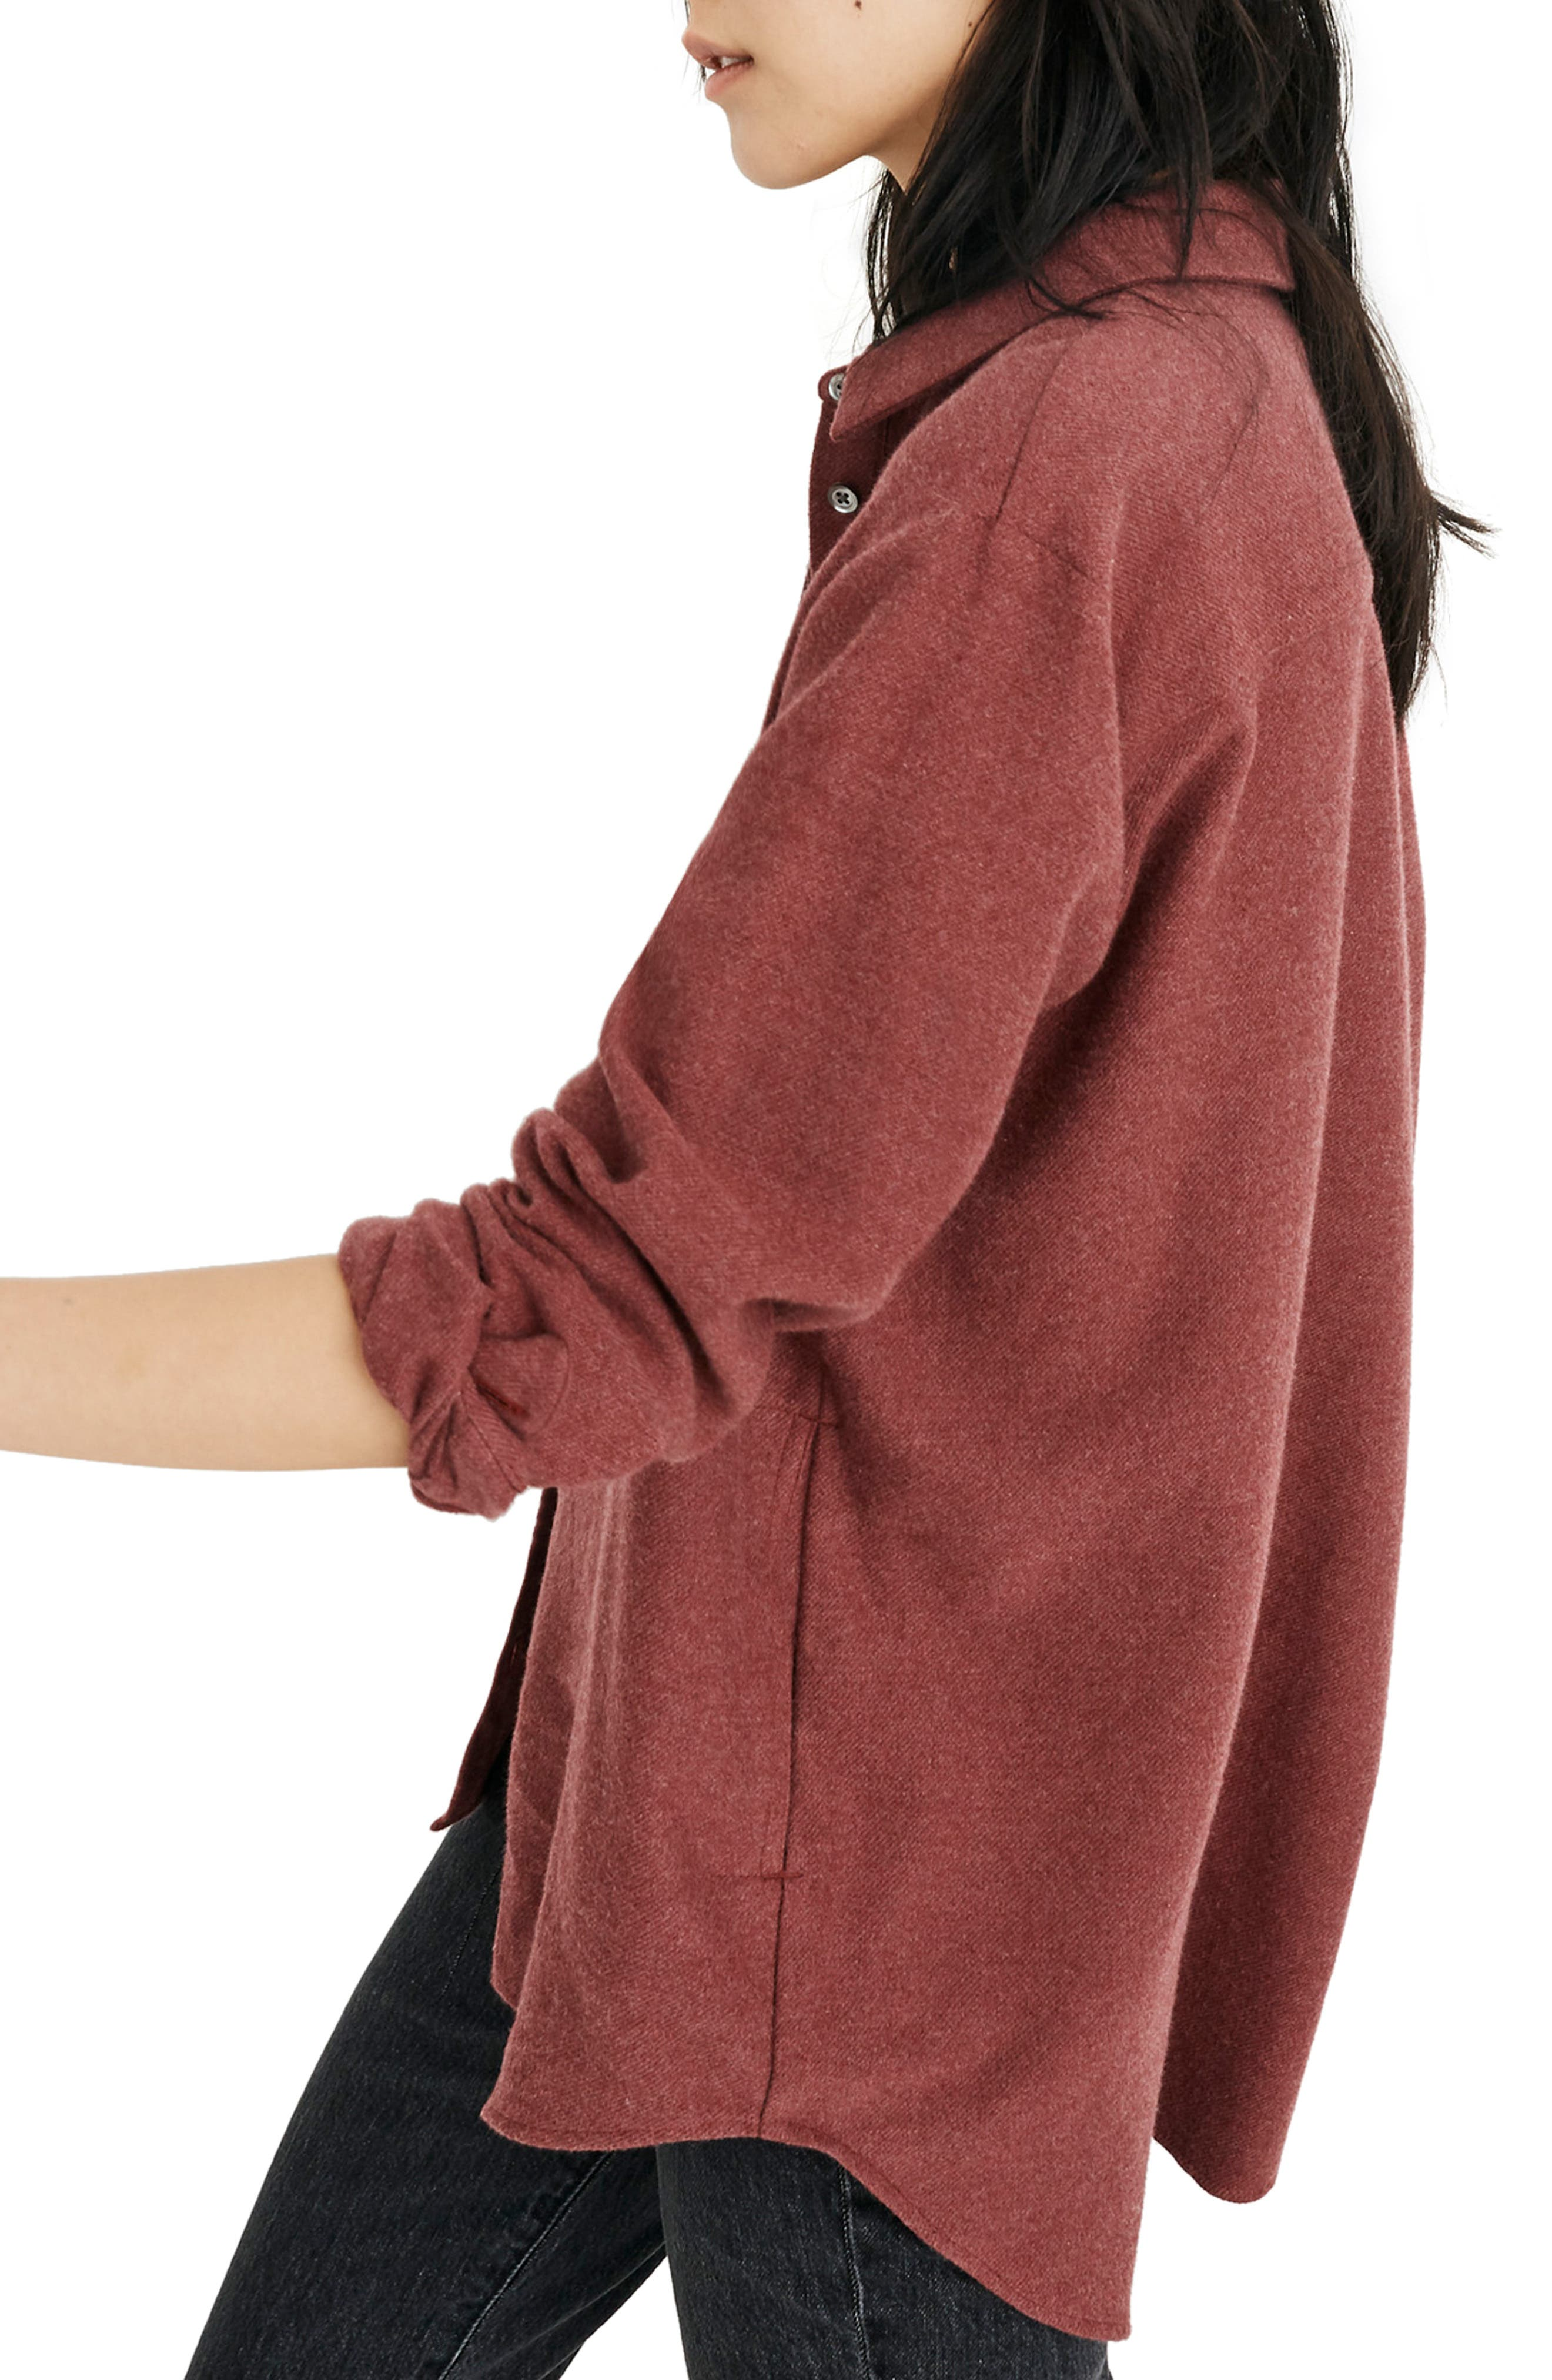 MADEWELL,                             Flannel Sunday Shirt,                             Alternate thumbnail 4, color,                             600